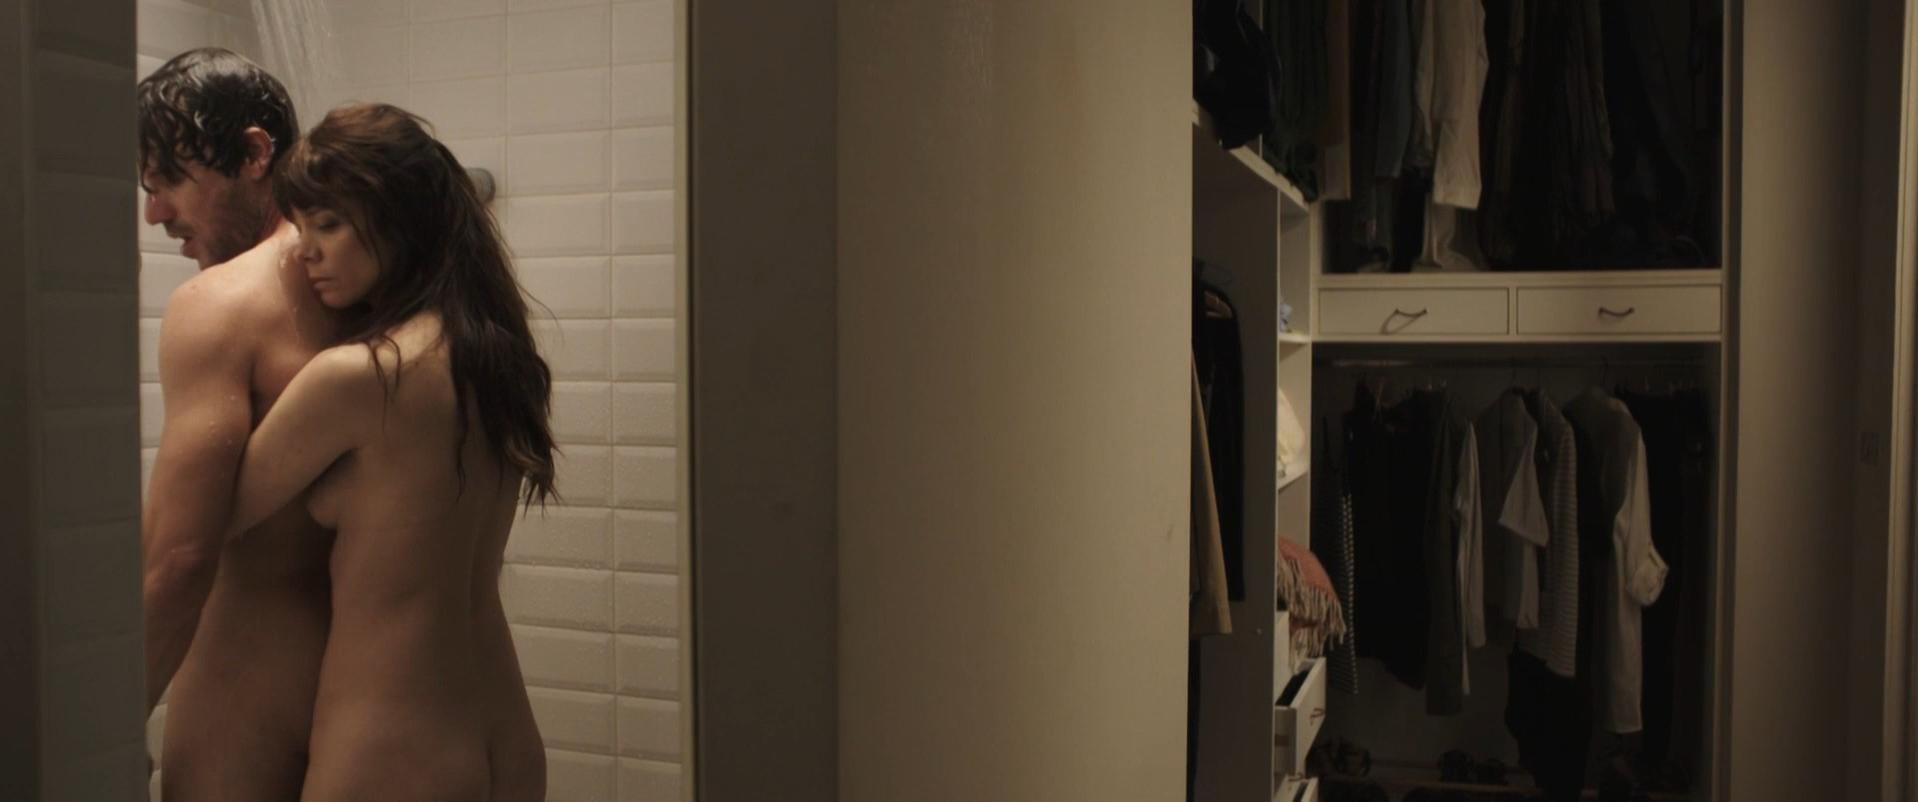 Juana Acosta nude, Ingrid Garcia Jonsson nude - Acantilado (2016)